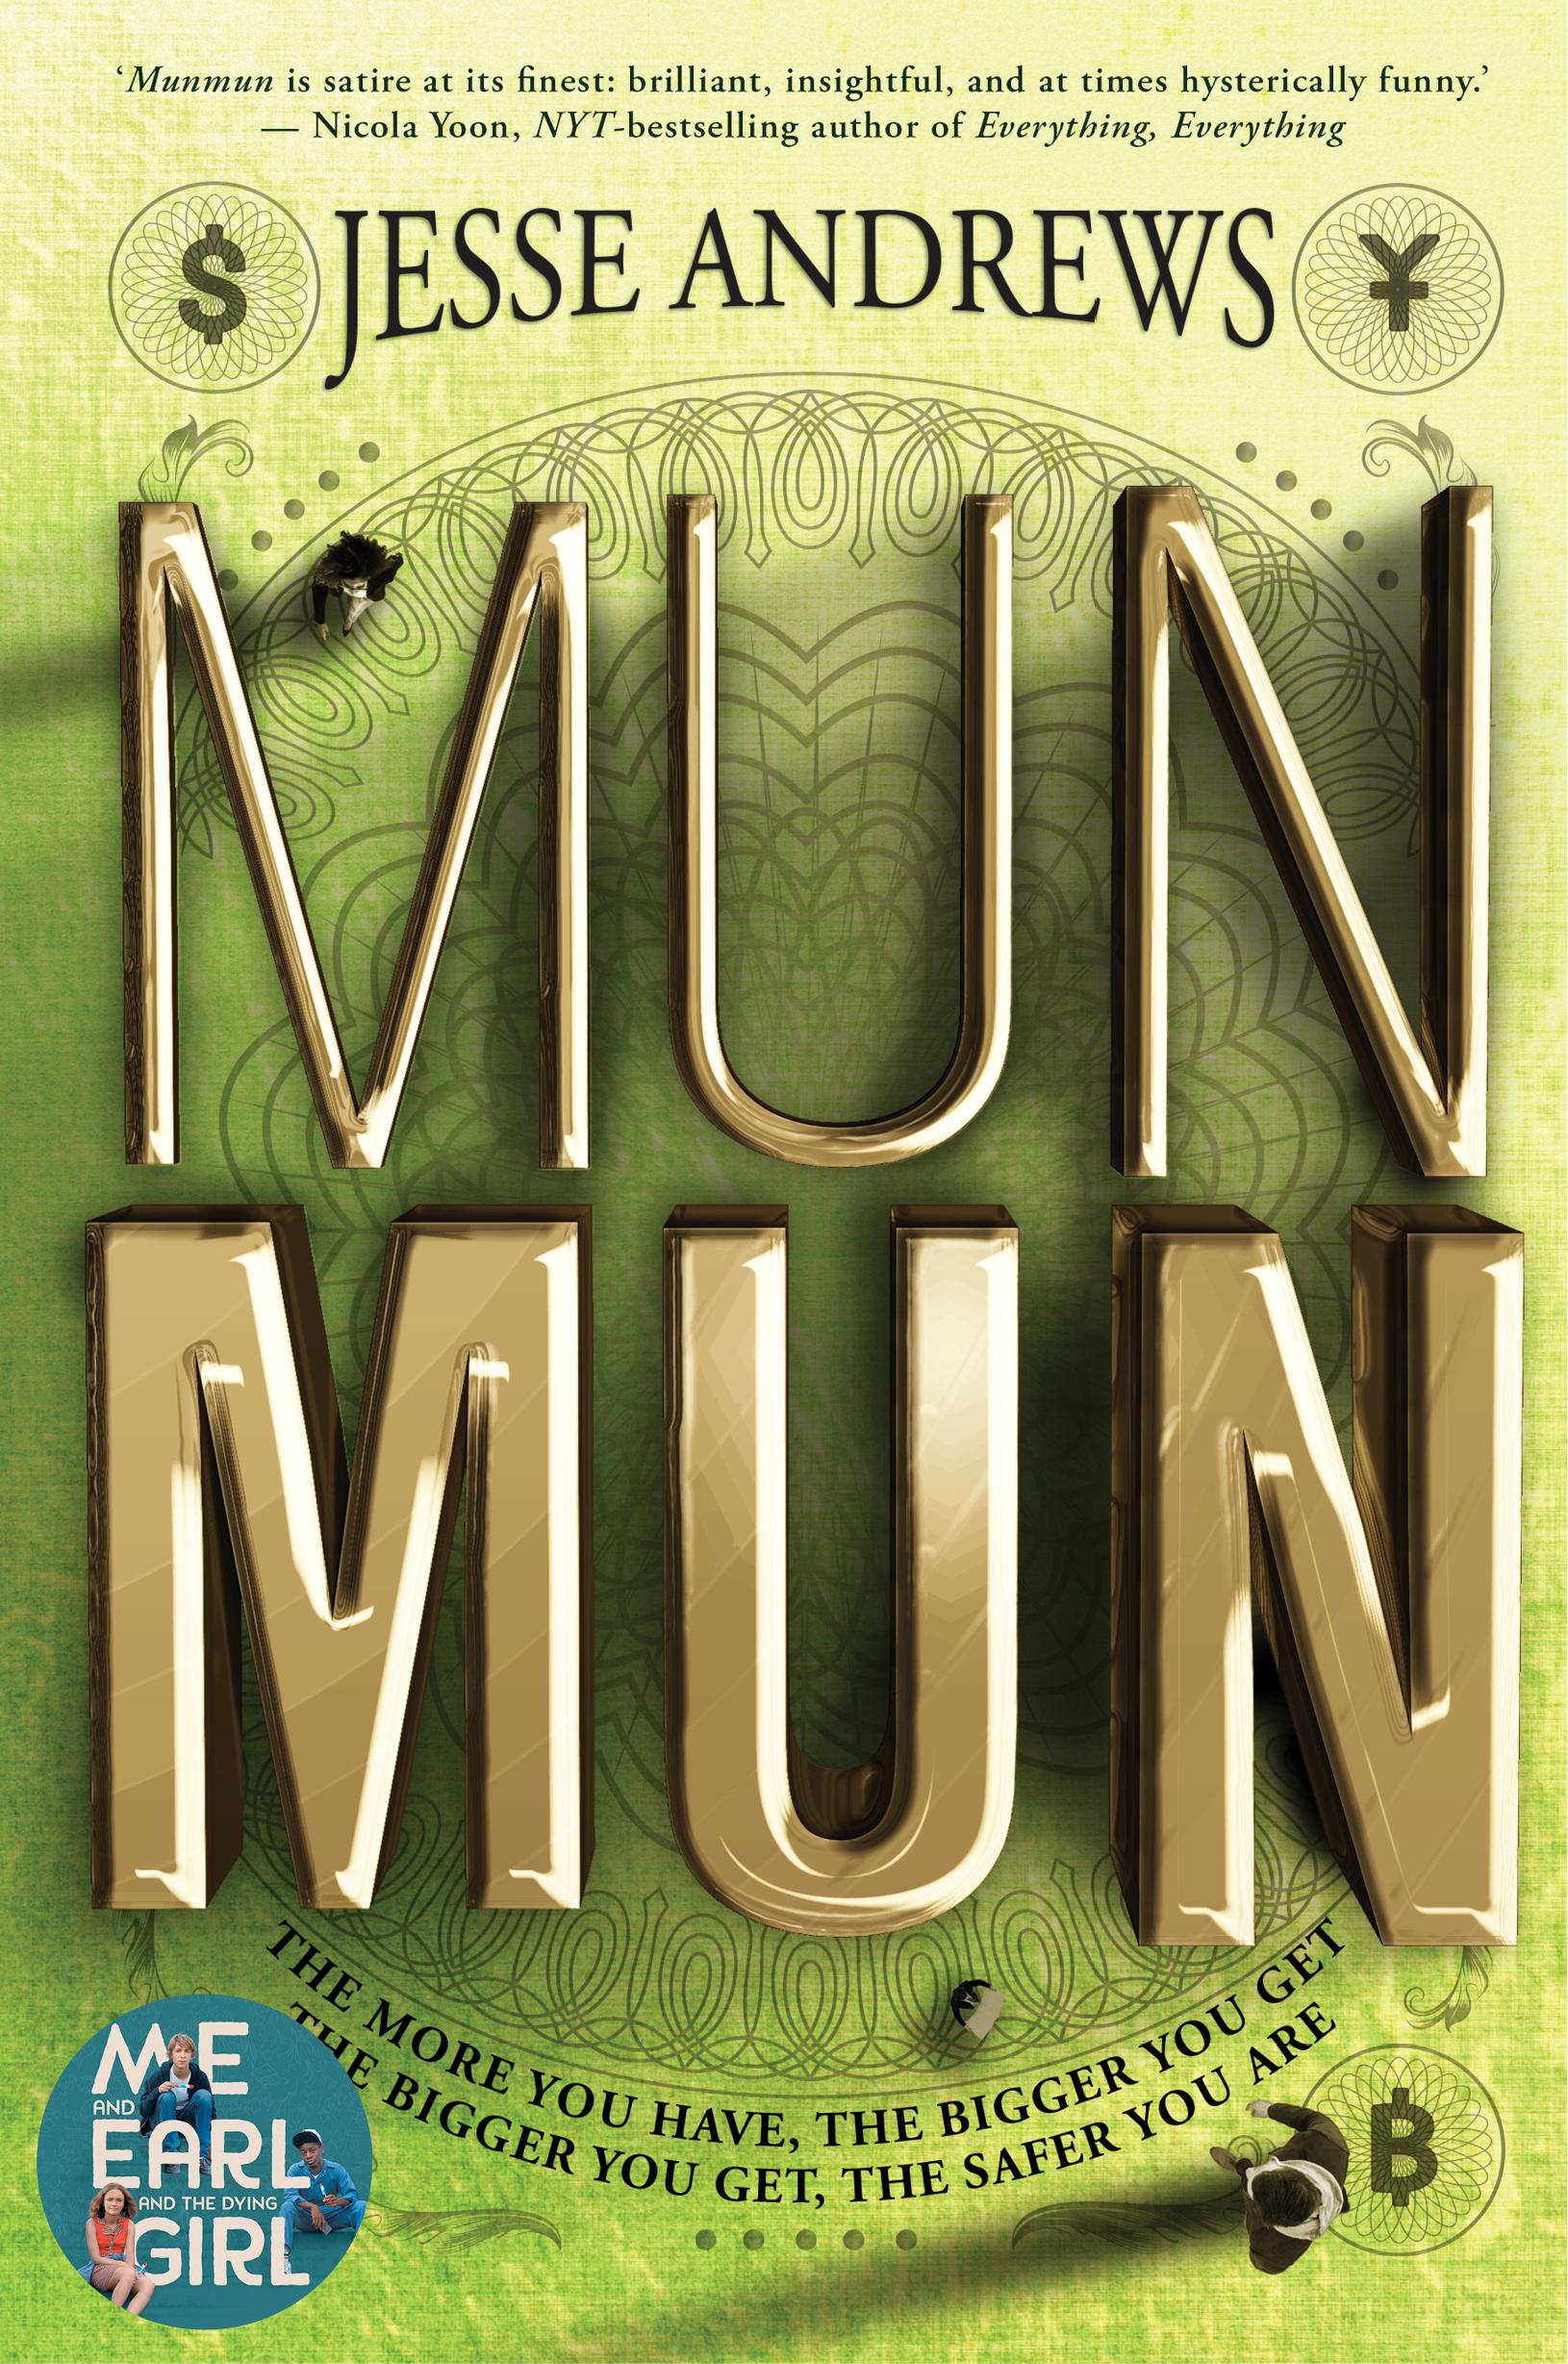 Munmun by Jesse Andrews